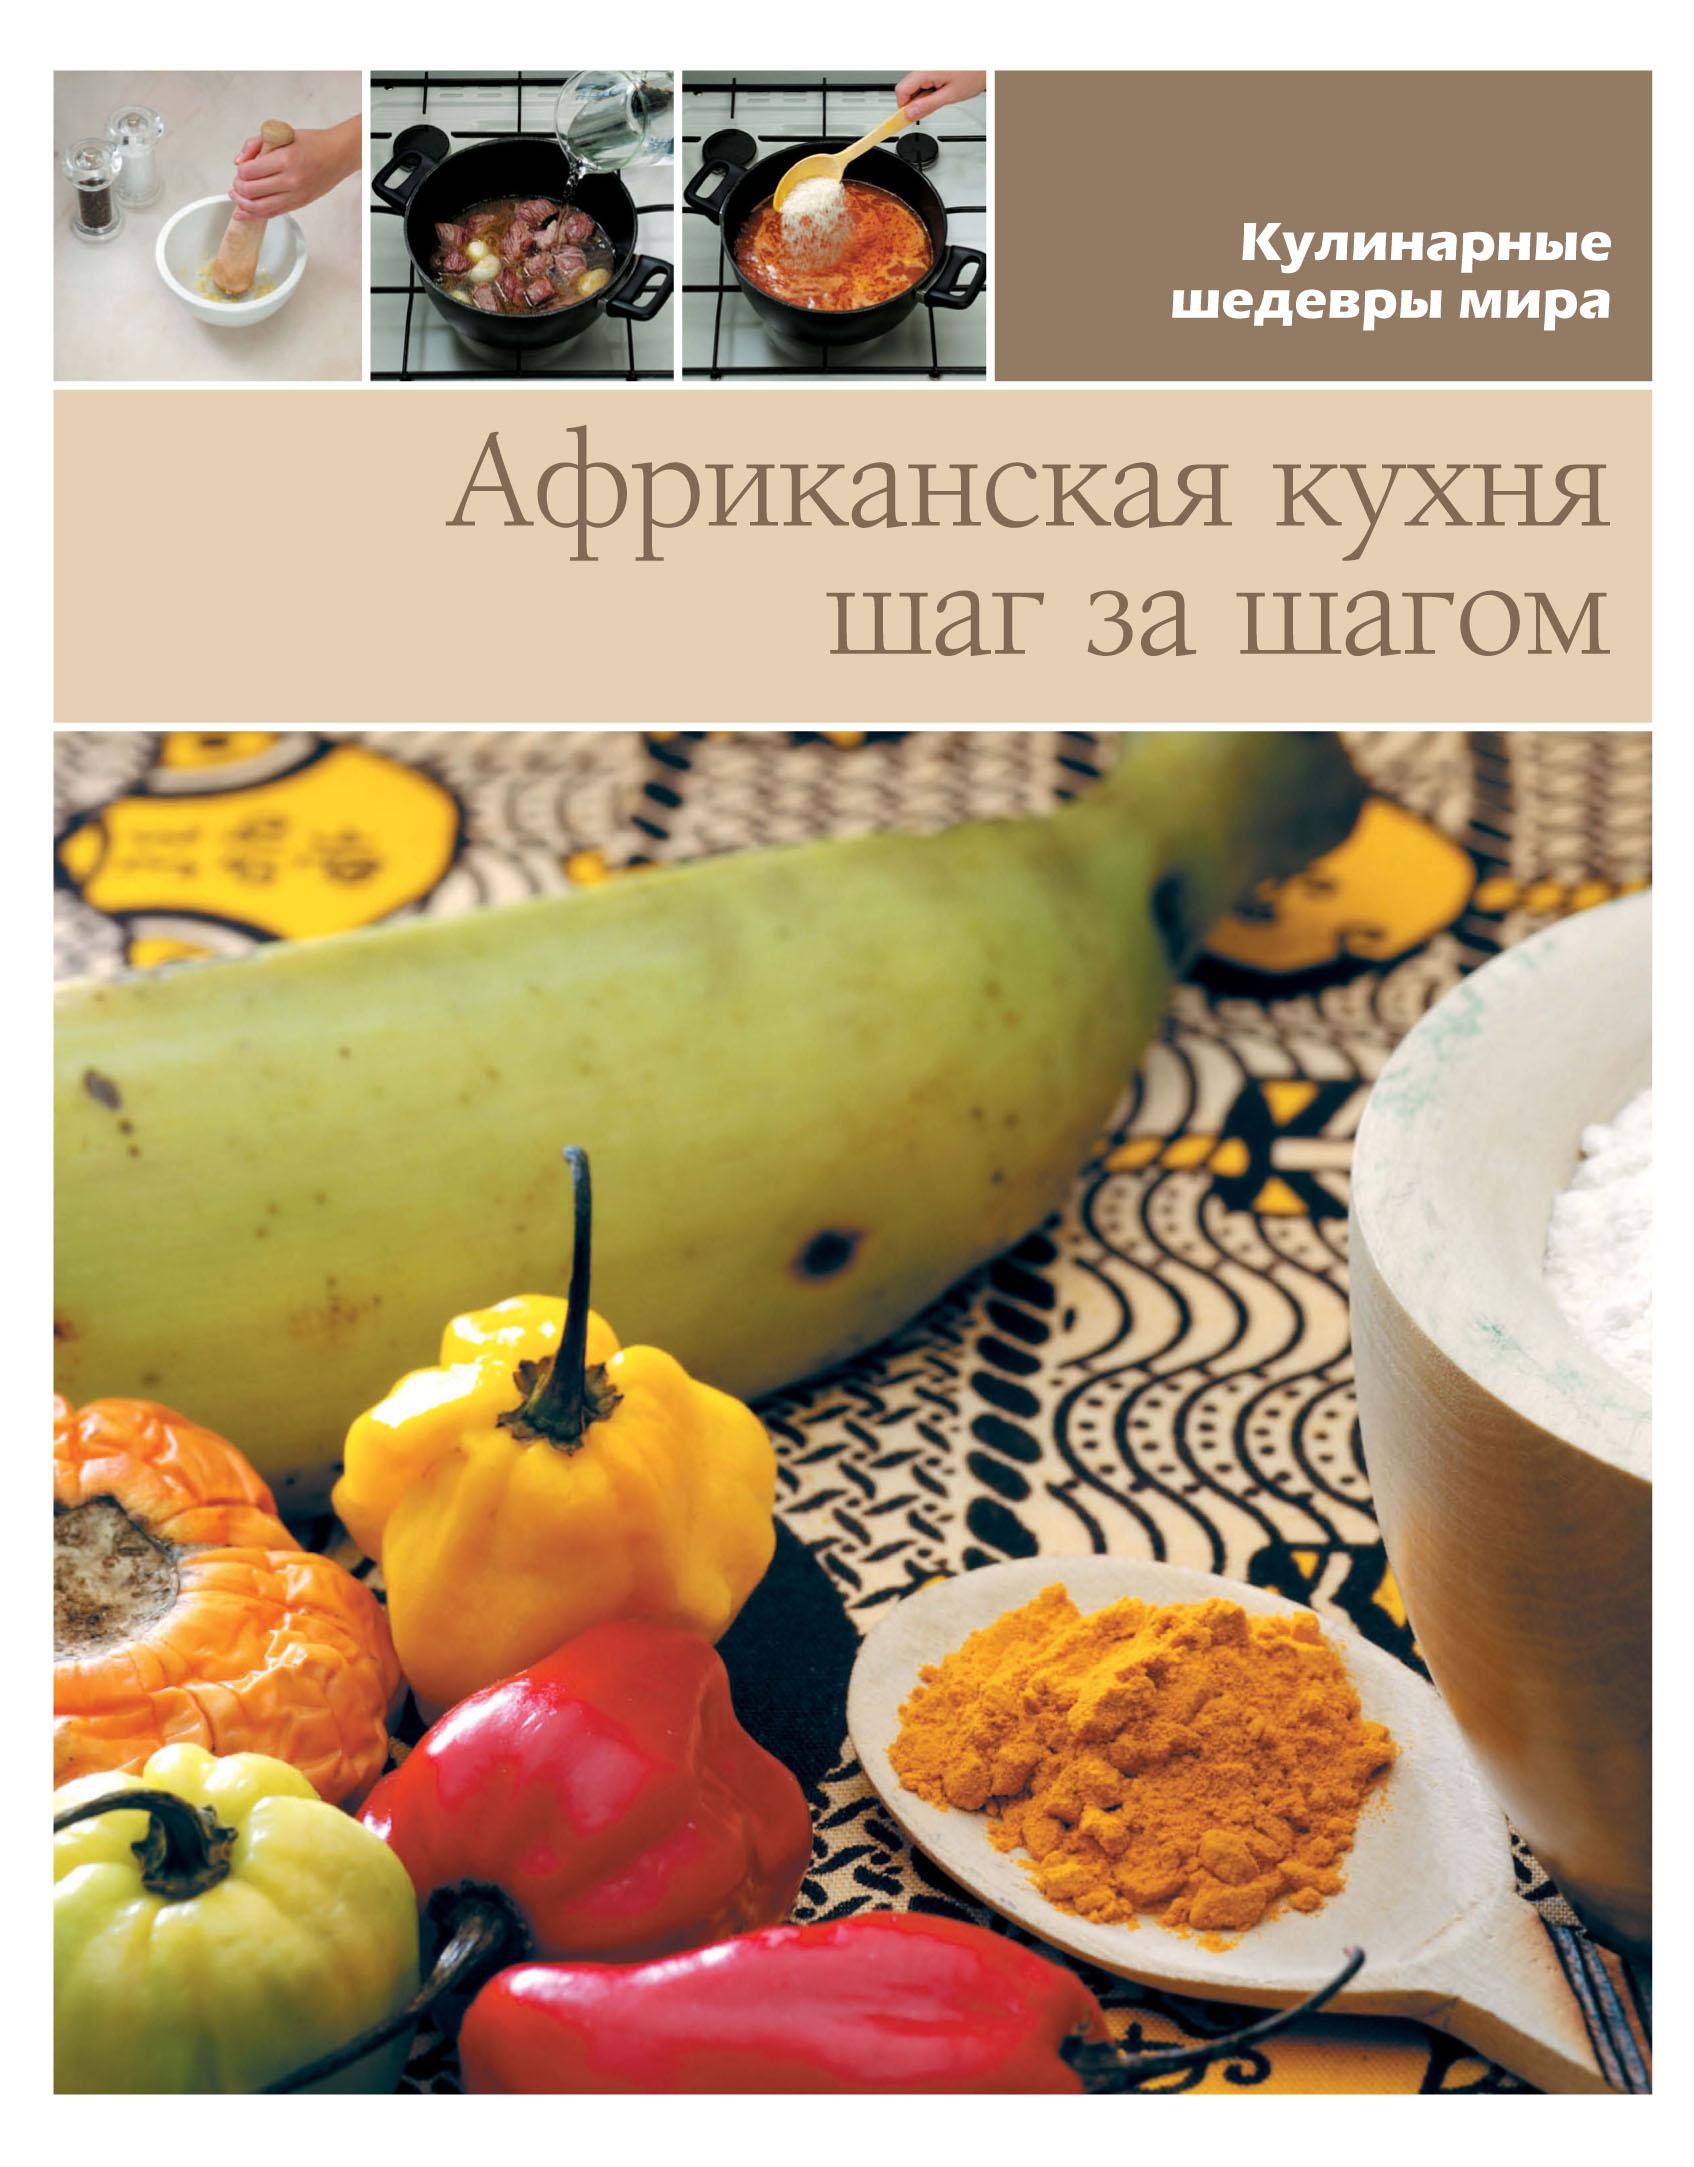 Отсутствует Африканская кухня шаг за шагом отсутствует итальянская кухня шаг за шагом – 1